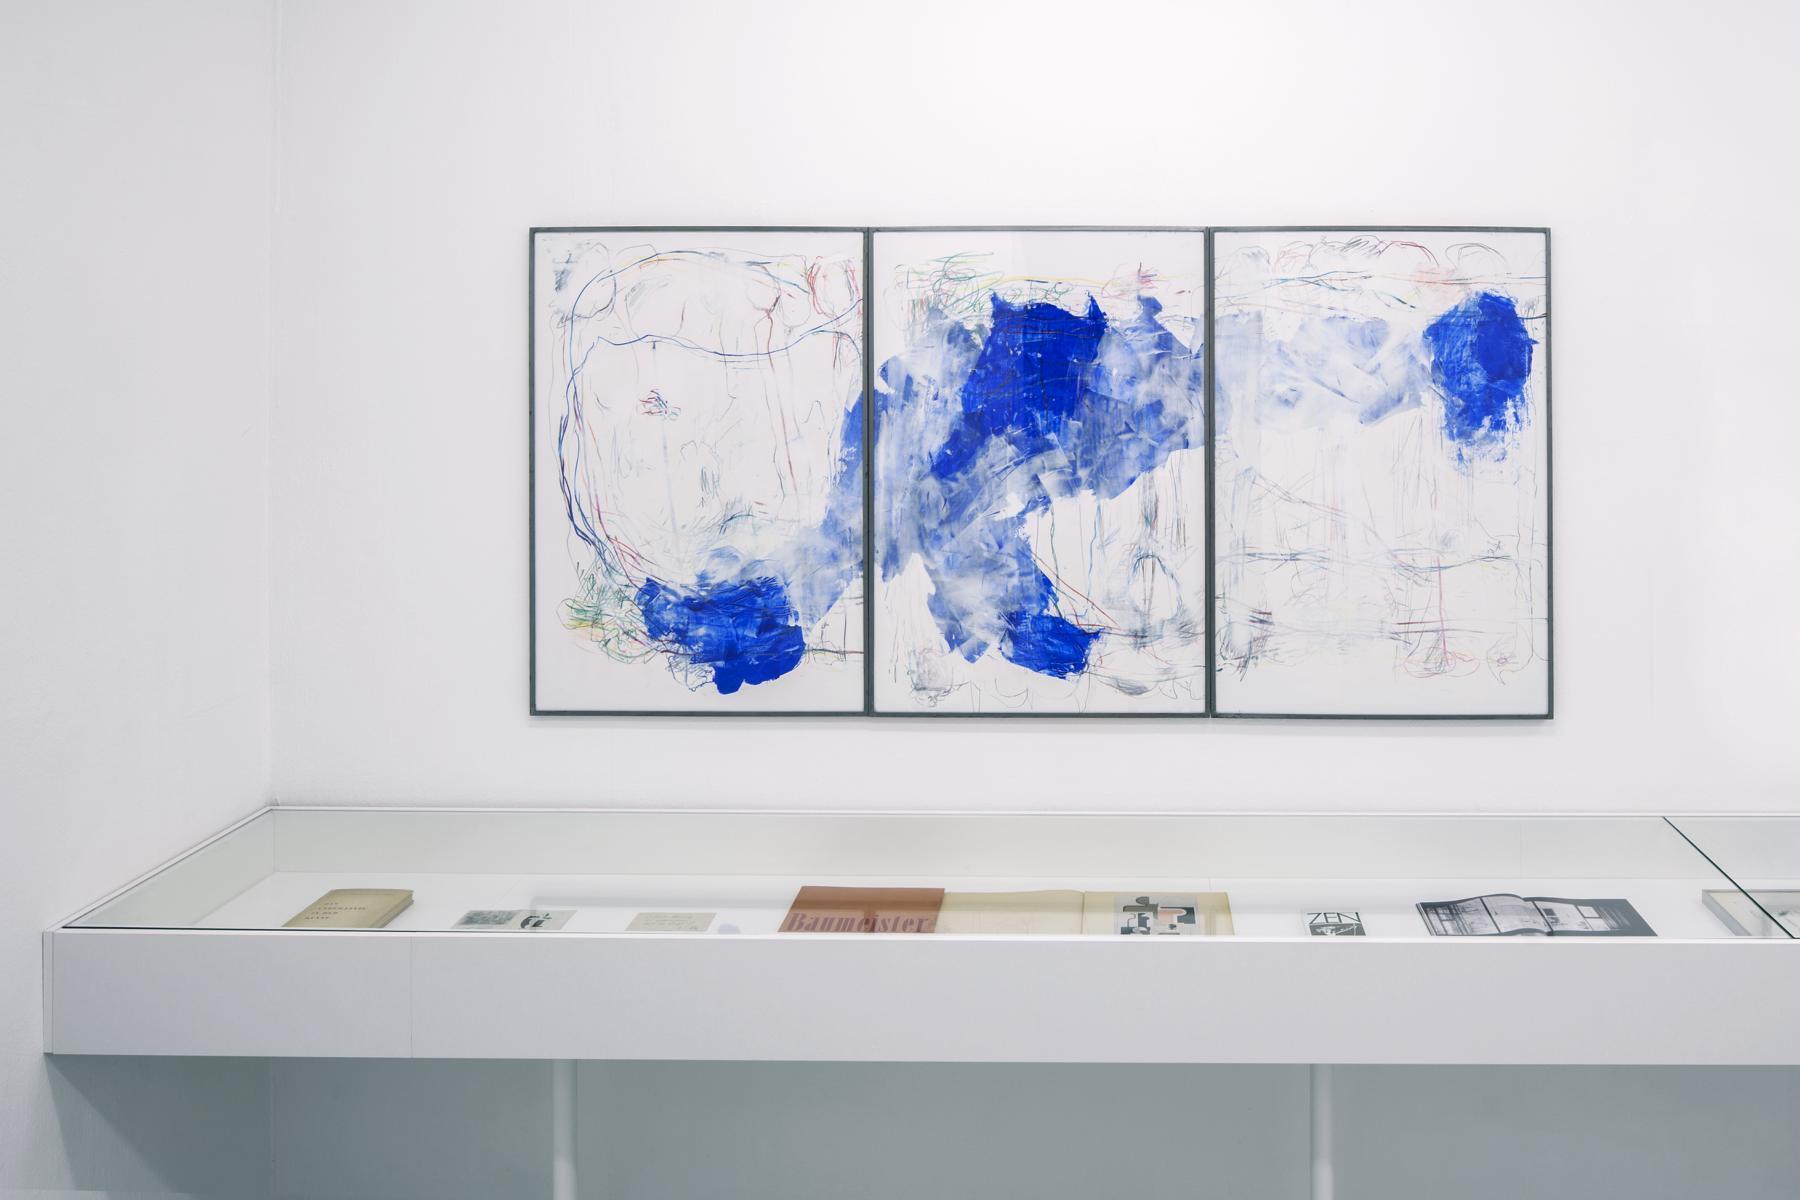 K1600_Mosny_Gonn_2017_Ausstellungsansicht_Verena_Nagl_10